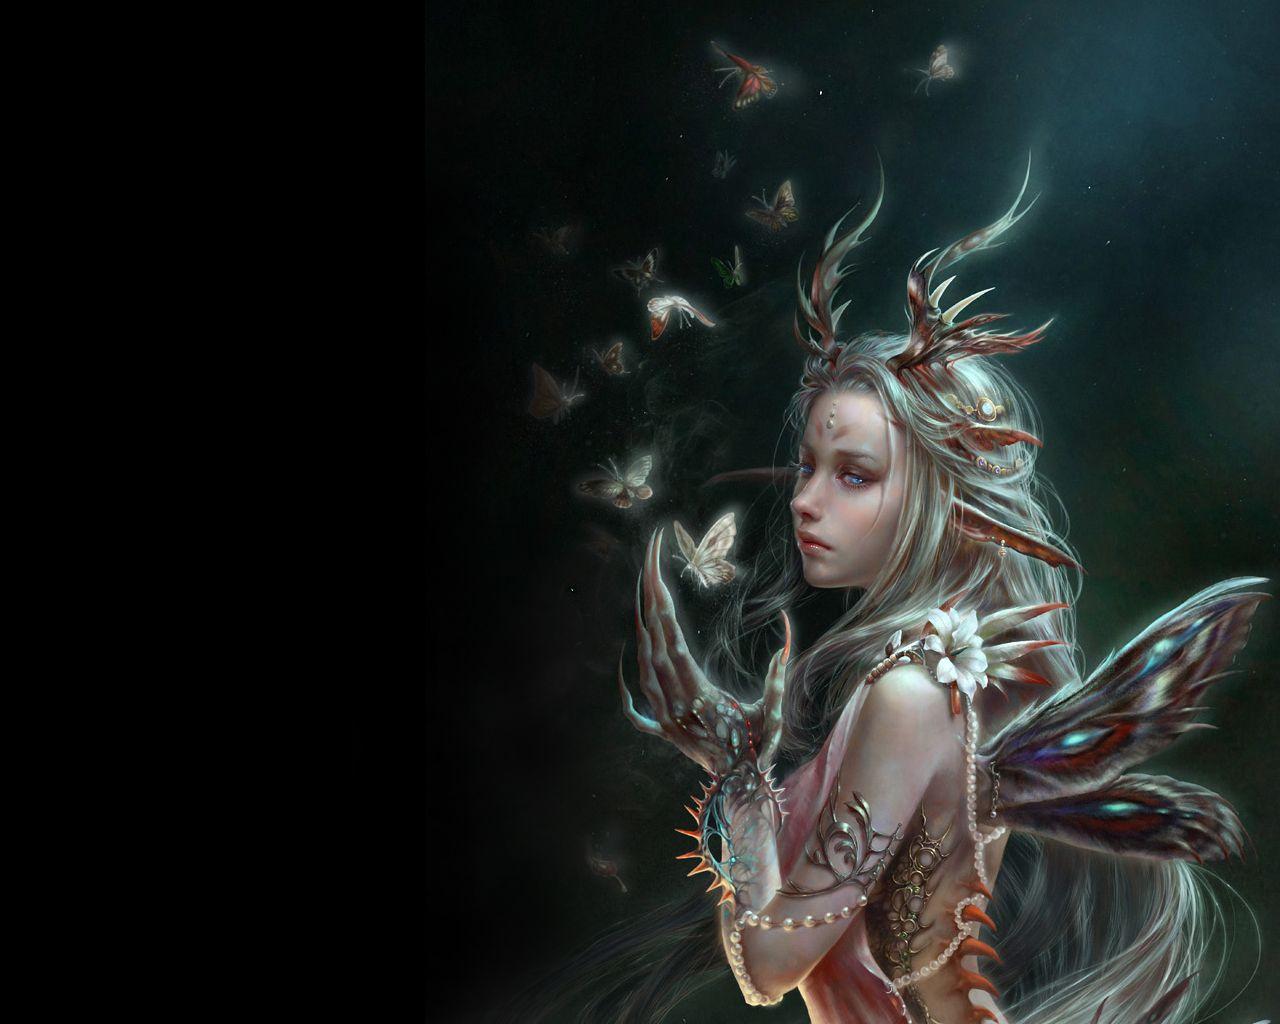 36 best fantasy images on pinterest | fantasy fairies, fantasy